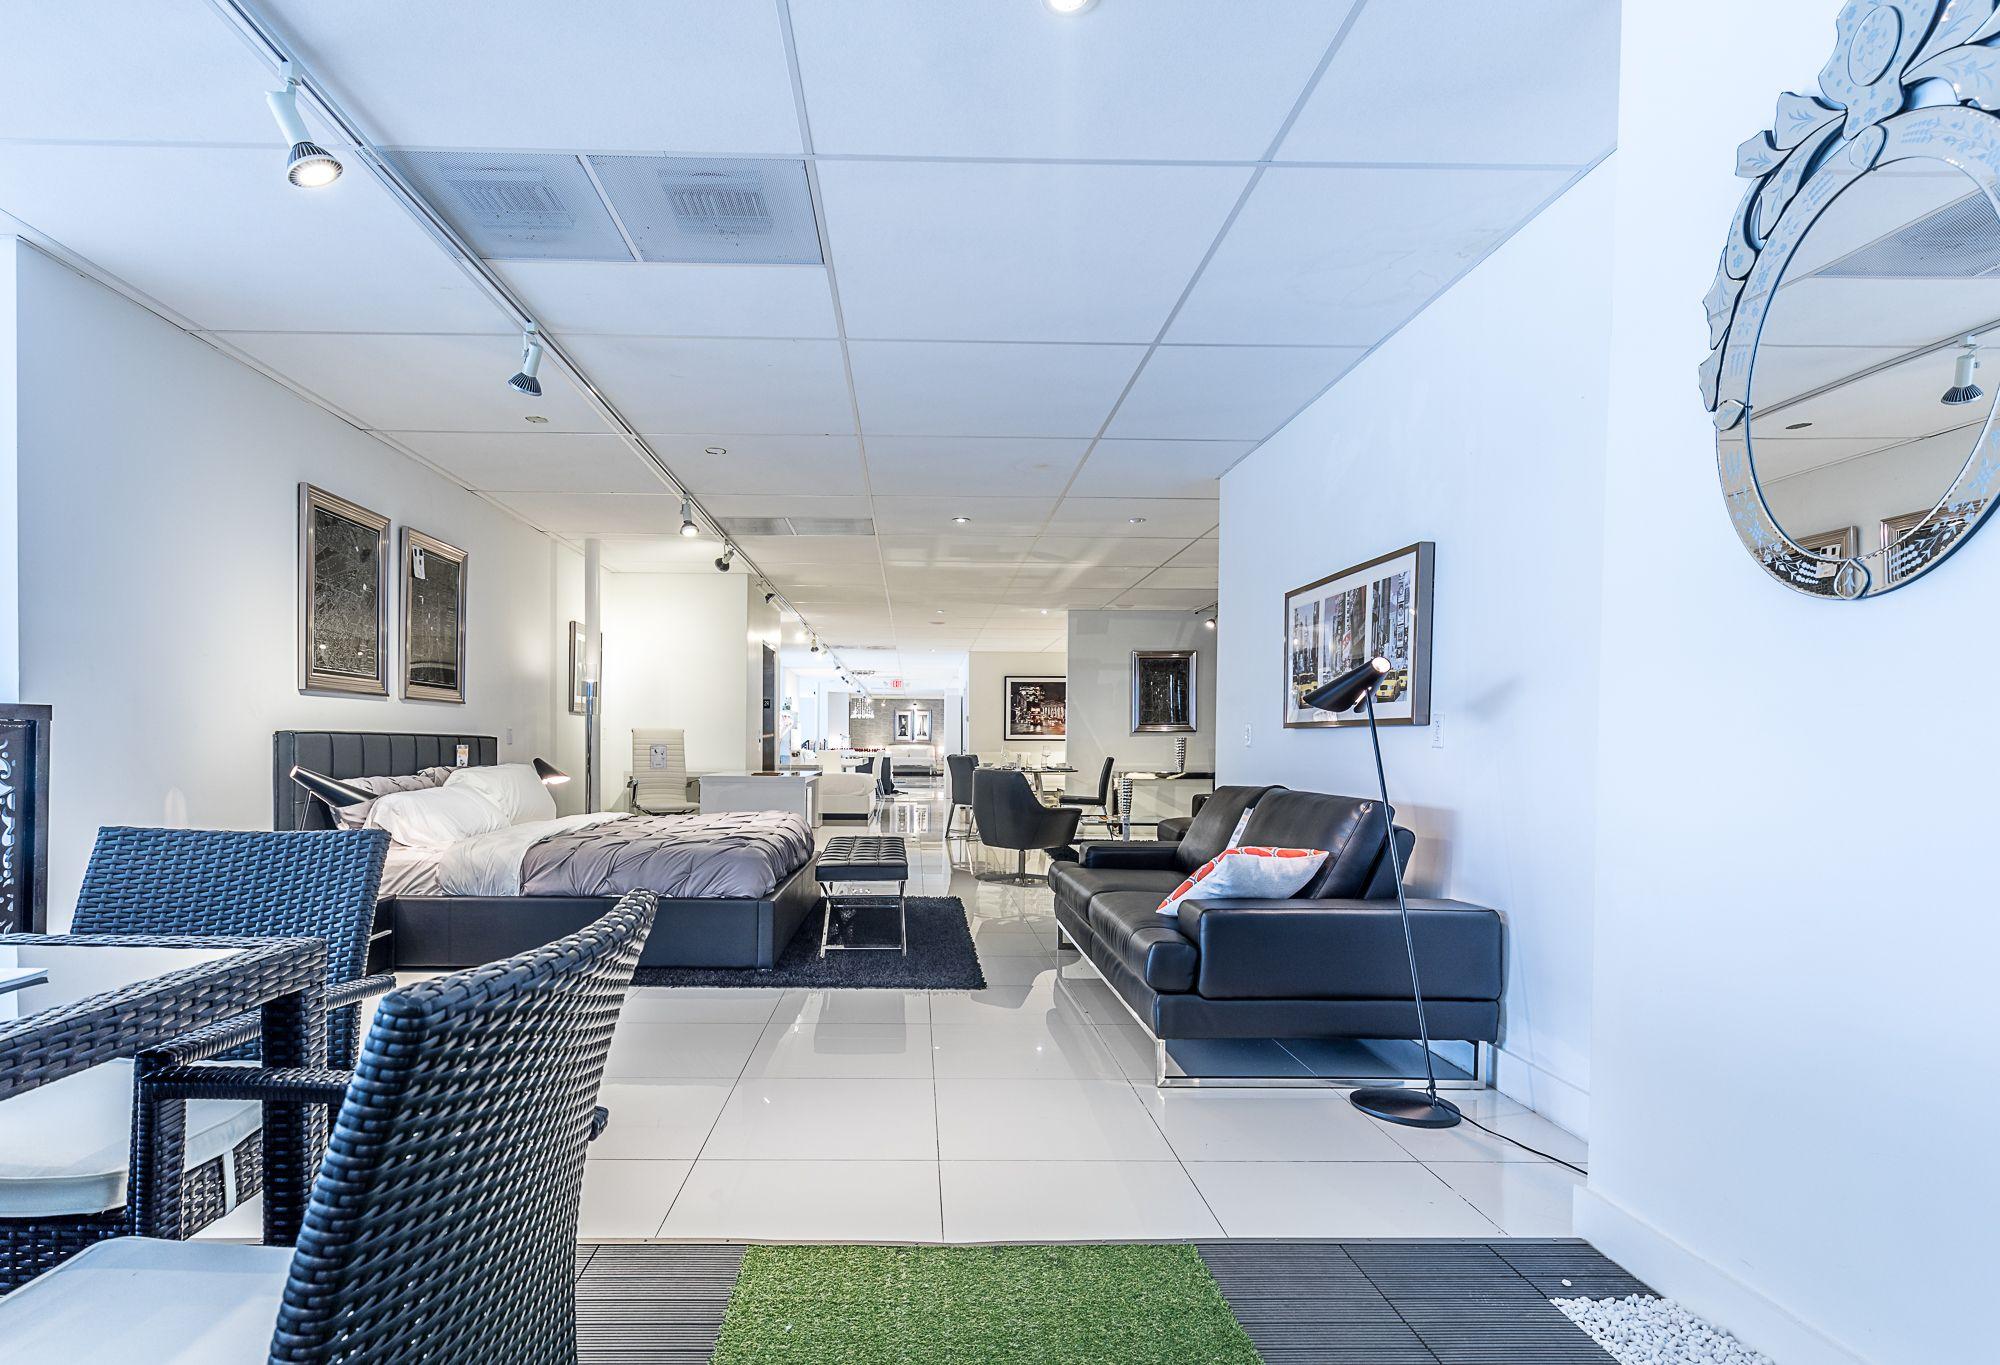 Modanifurniture homedecor homedecorideas furniture design interiordesign homefurniture houston texas longhorns livingroomfurniture modern